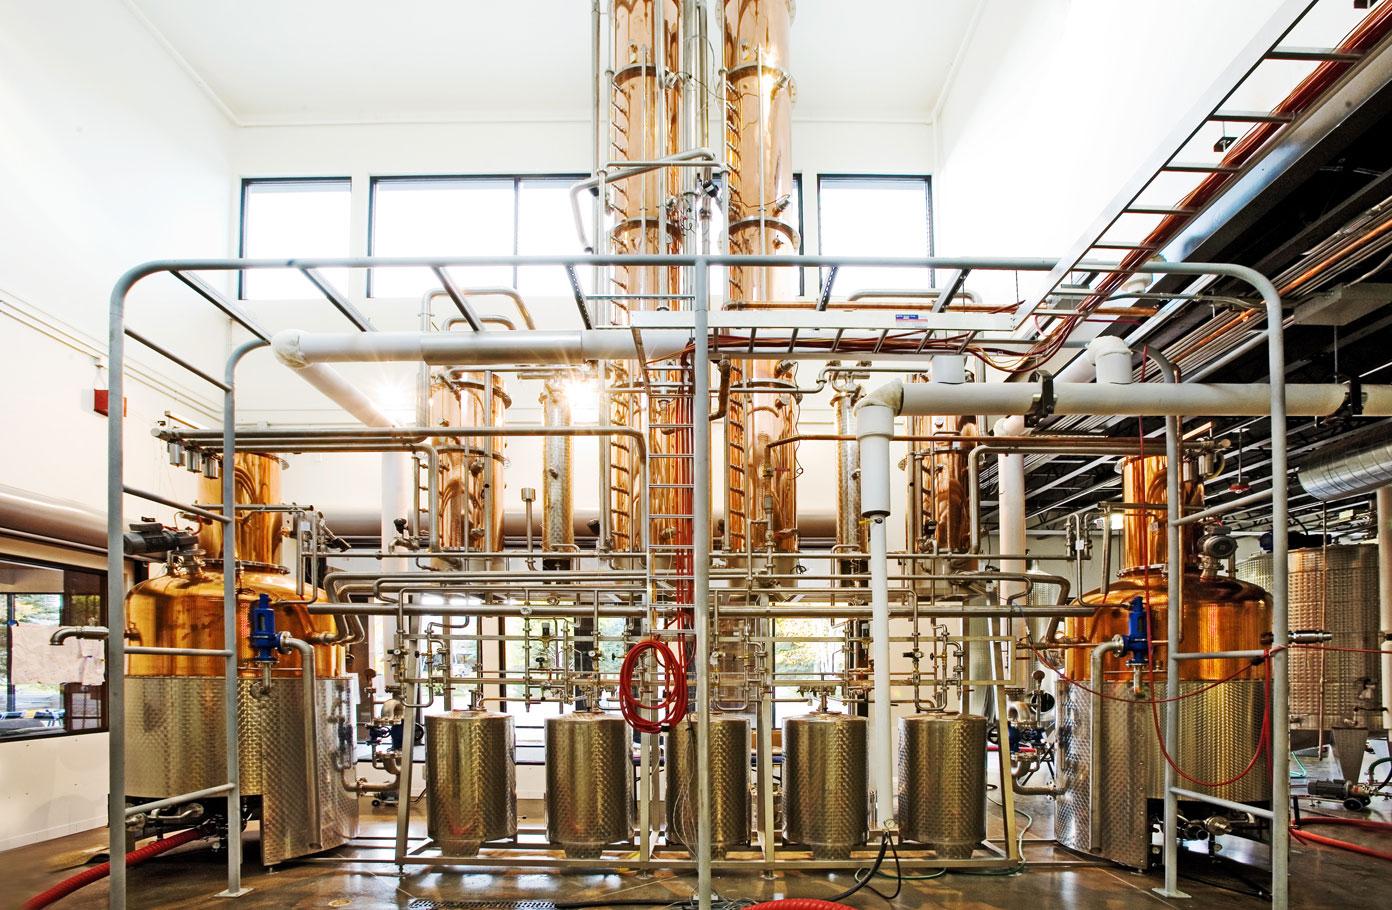 Where to Stop on a Tour of Colorado Distilleries